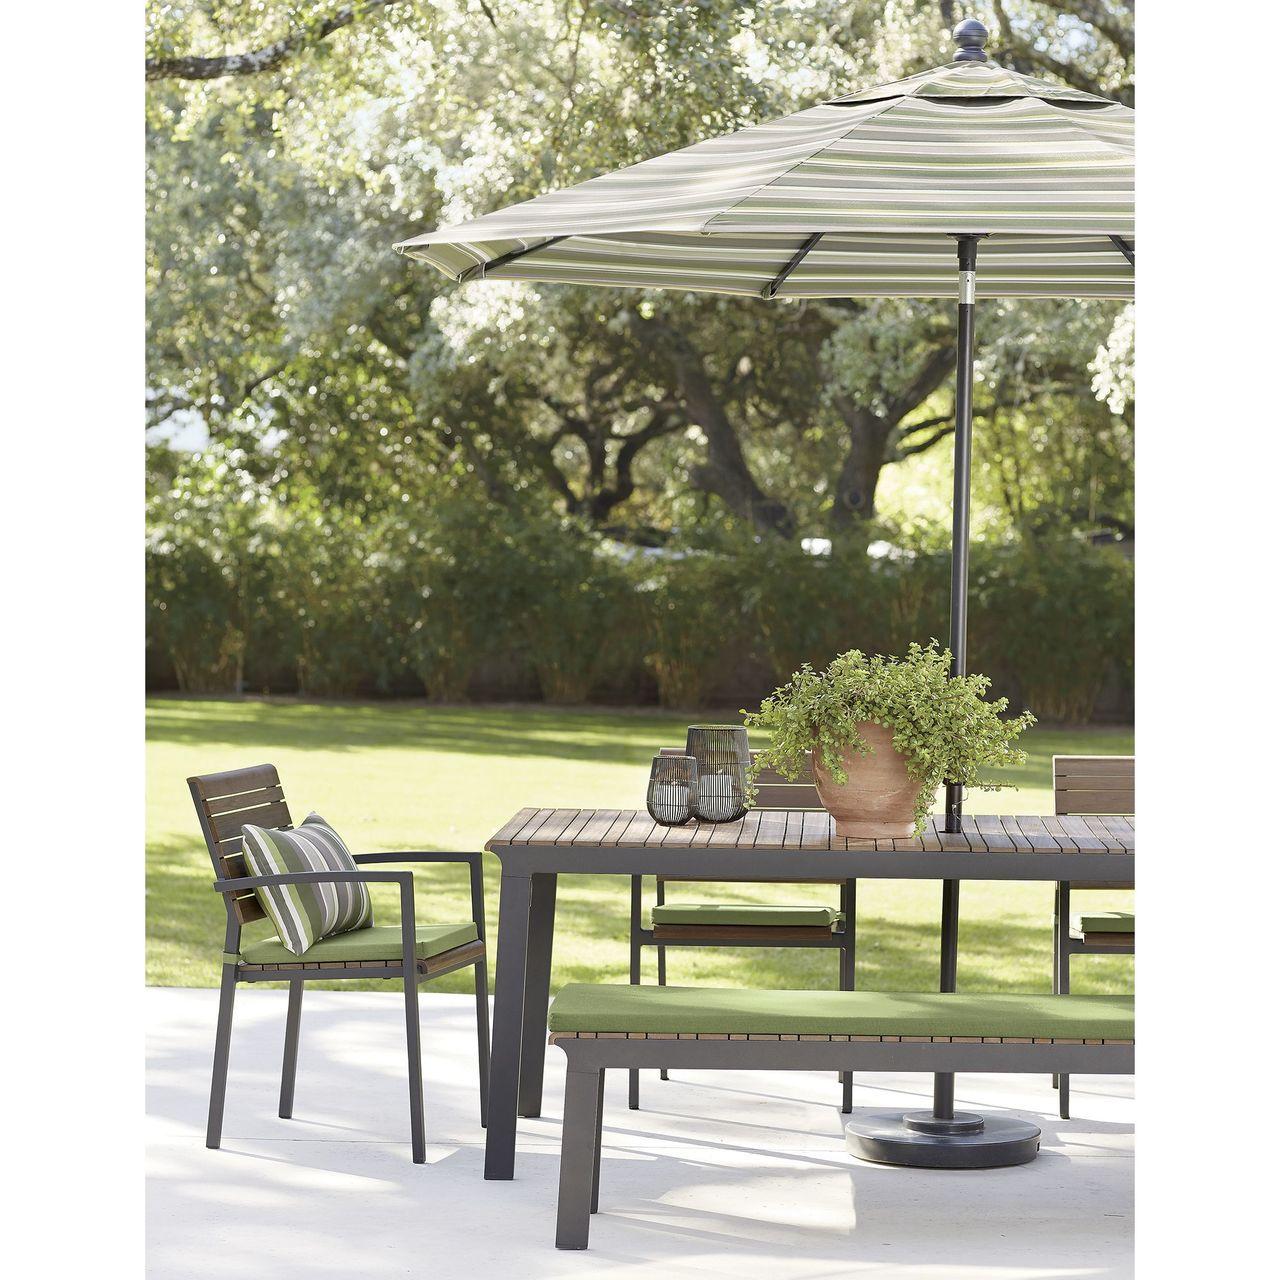 Rocha II戶外餐桌,原價32,000元;Rocha II戶外扶手餐椅,原價...